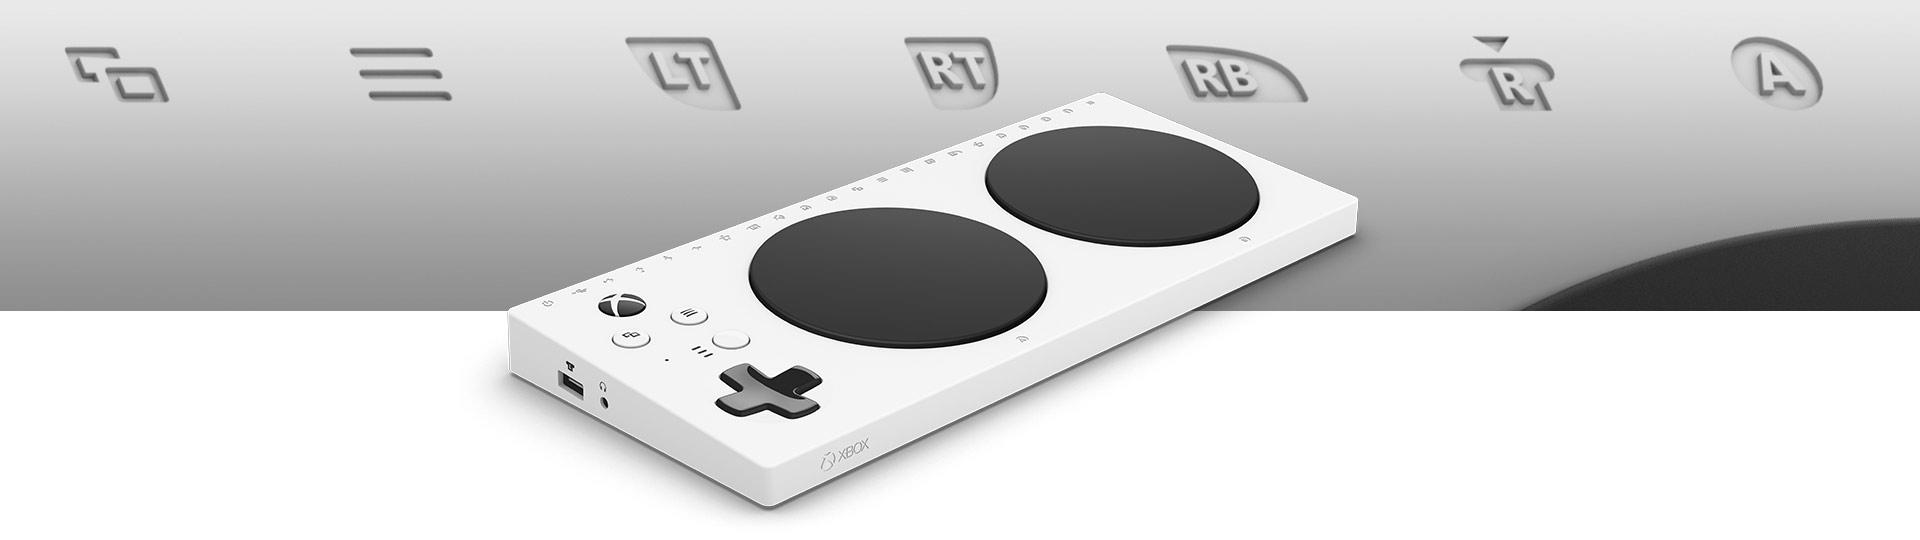 medium resolution of xbox adaptive controller